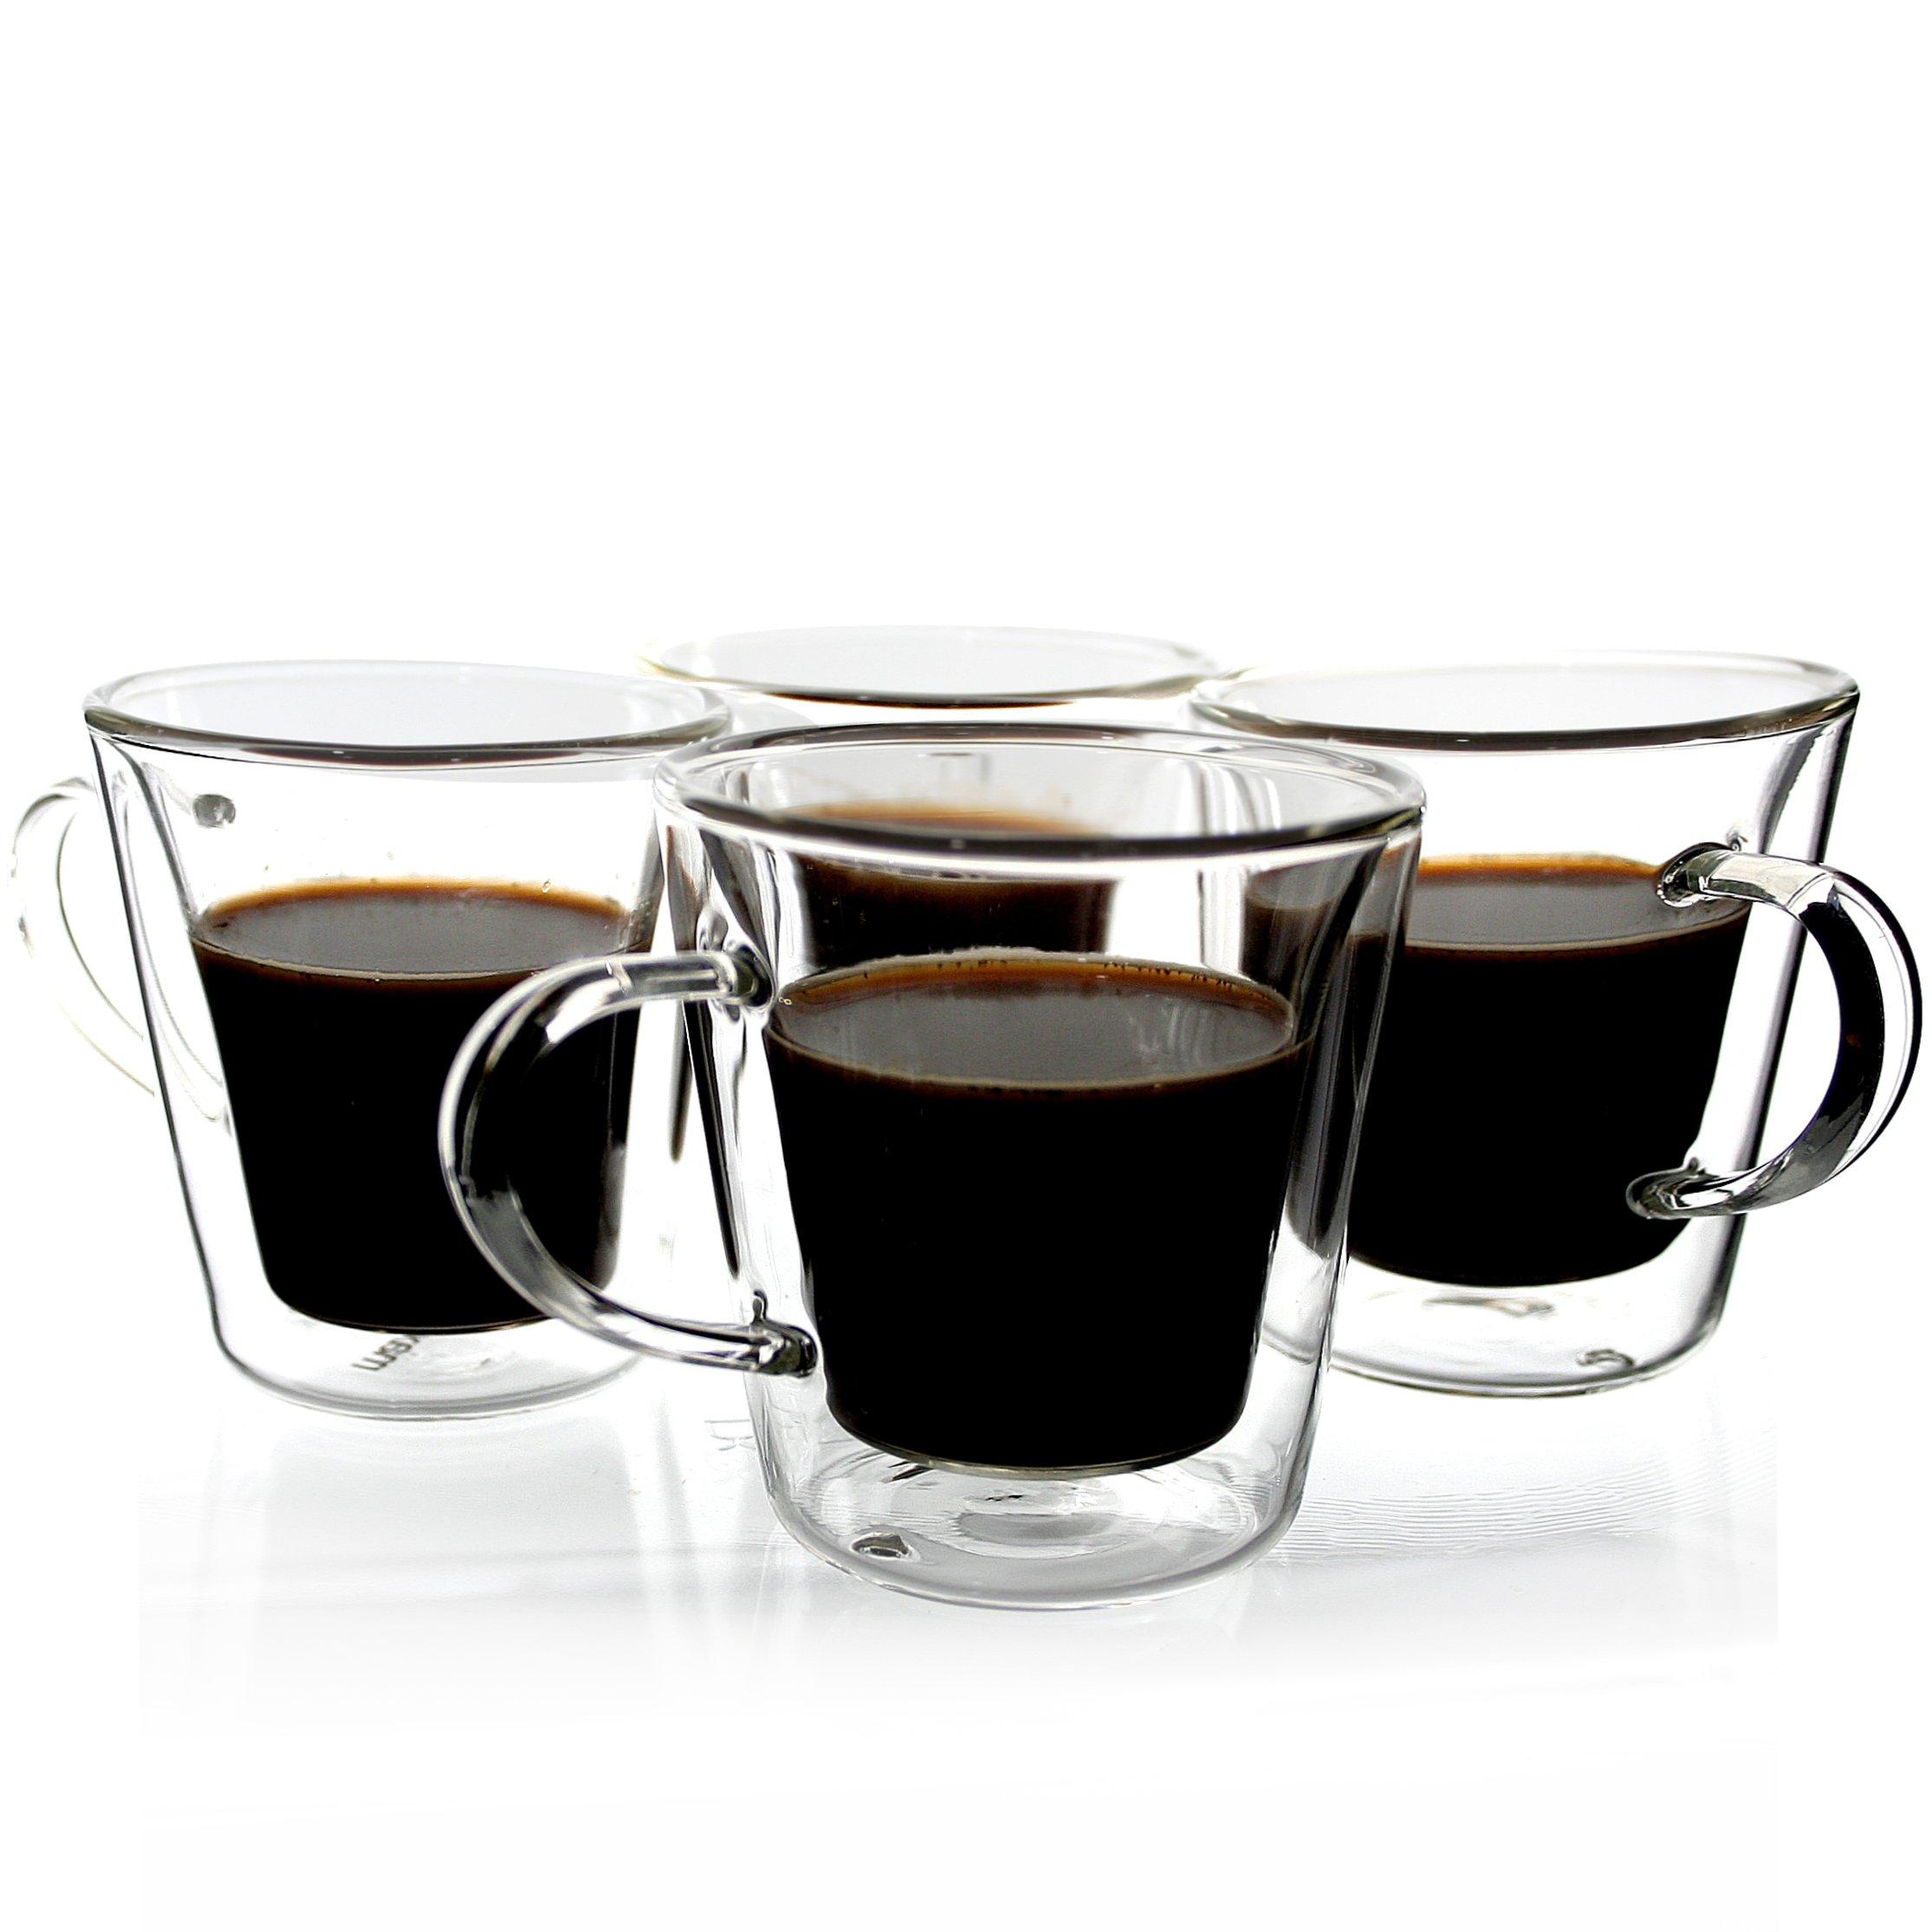 Janazala Espresso Cups Shot Glass Set of 4, Double-Wall Insulated Glass Coffee Cups, Borosilicate Glass, Model TRAPEZIO, 3.5 oz, 100 mililiter